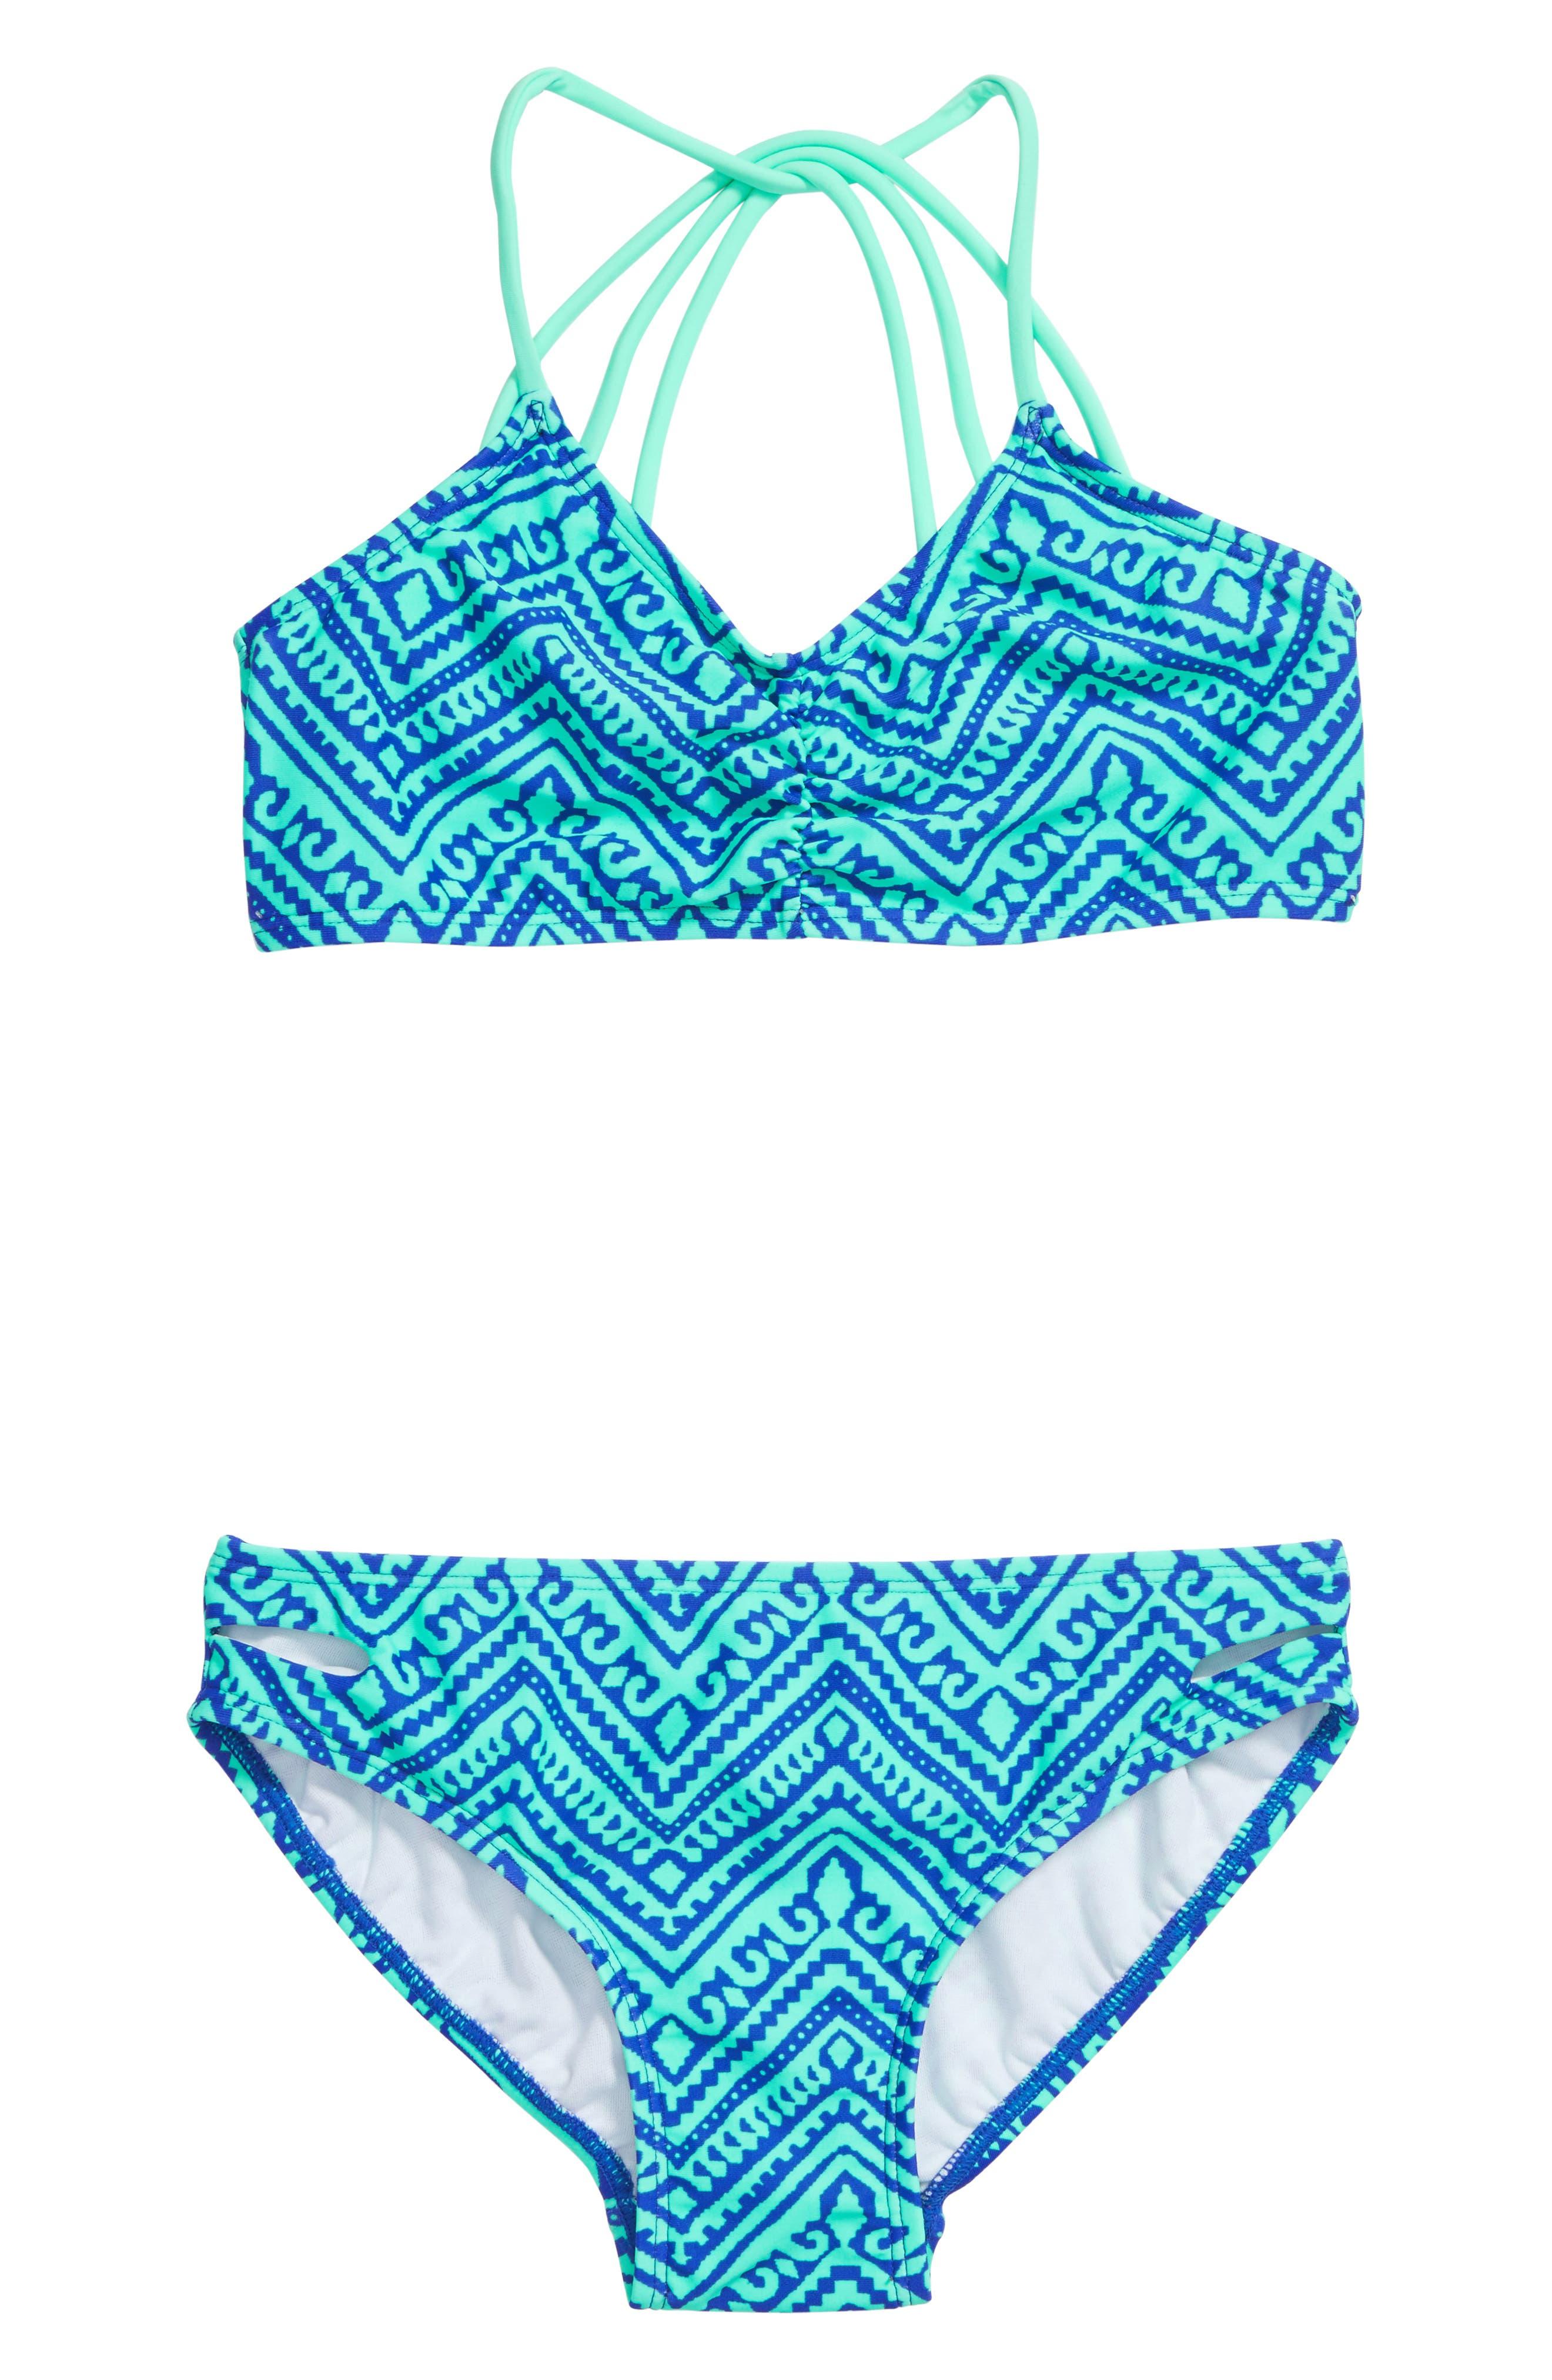 Alternate Image 1 Selected - Gossip Girl 'Zig & Zag' Geo Print Two-Piece Swimsuit (Big Girls)